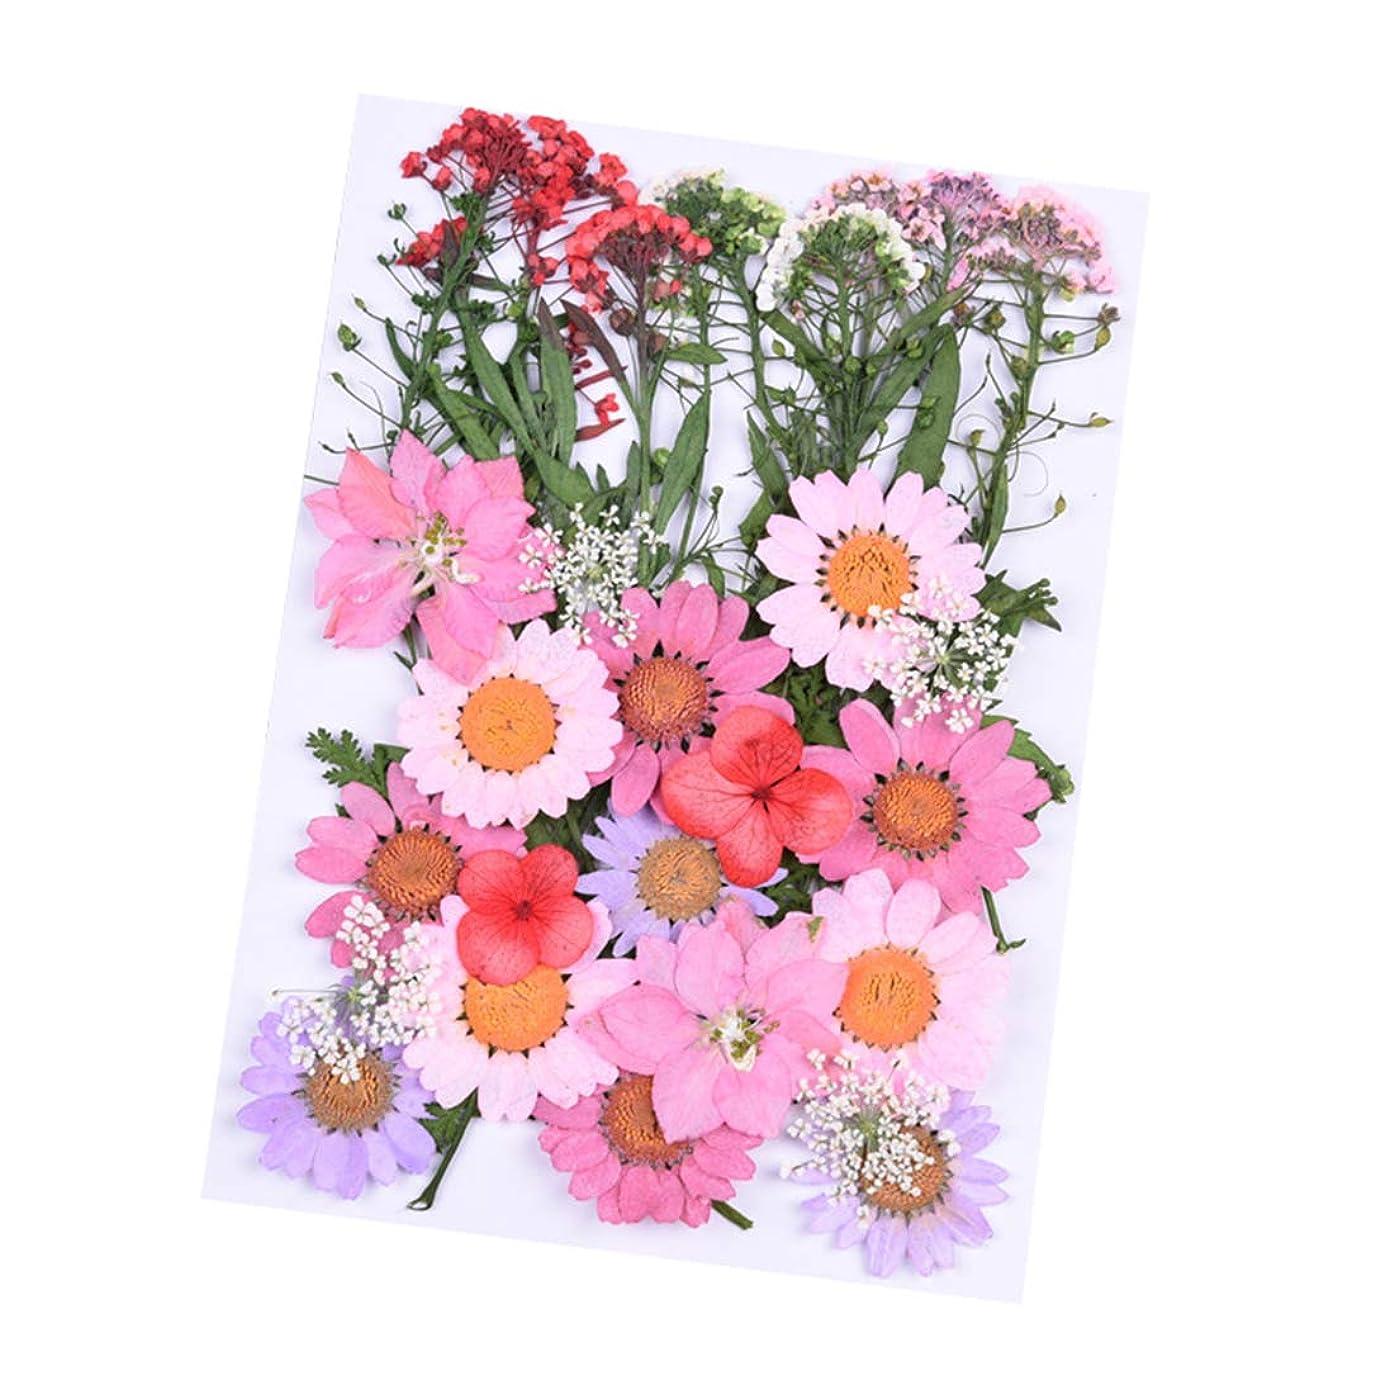 KIKISUM Pressed Herbarium Flower Natural Dried Daisy for DIY Crafts Jewelry Making Decorative (Mix-C)